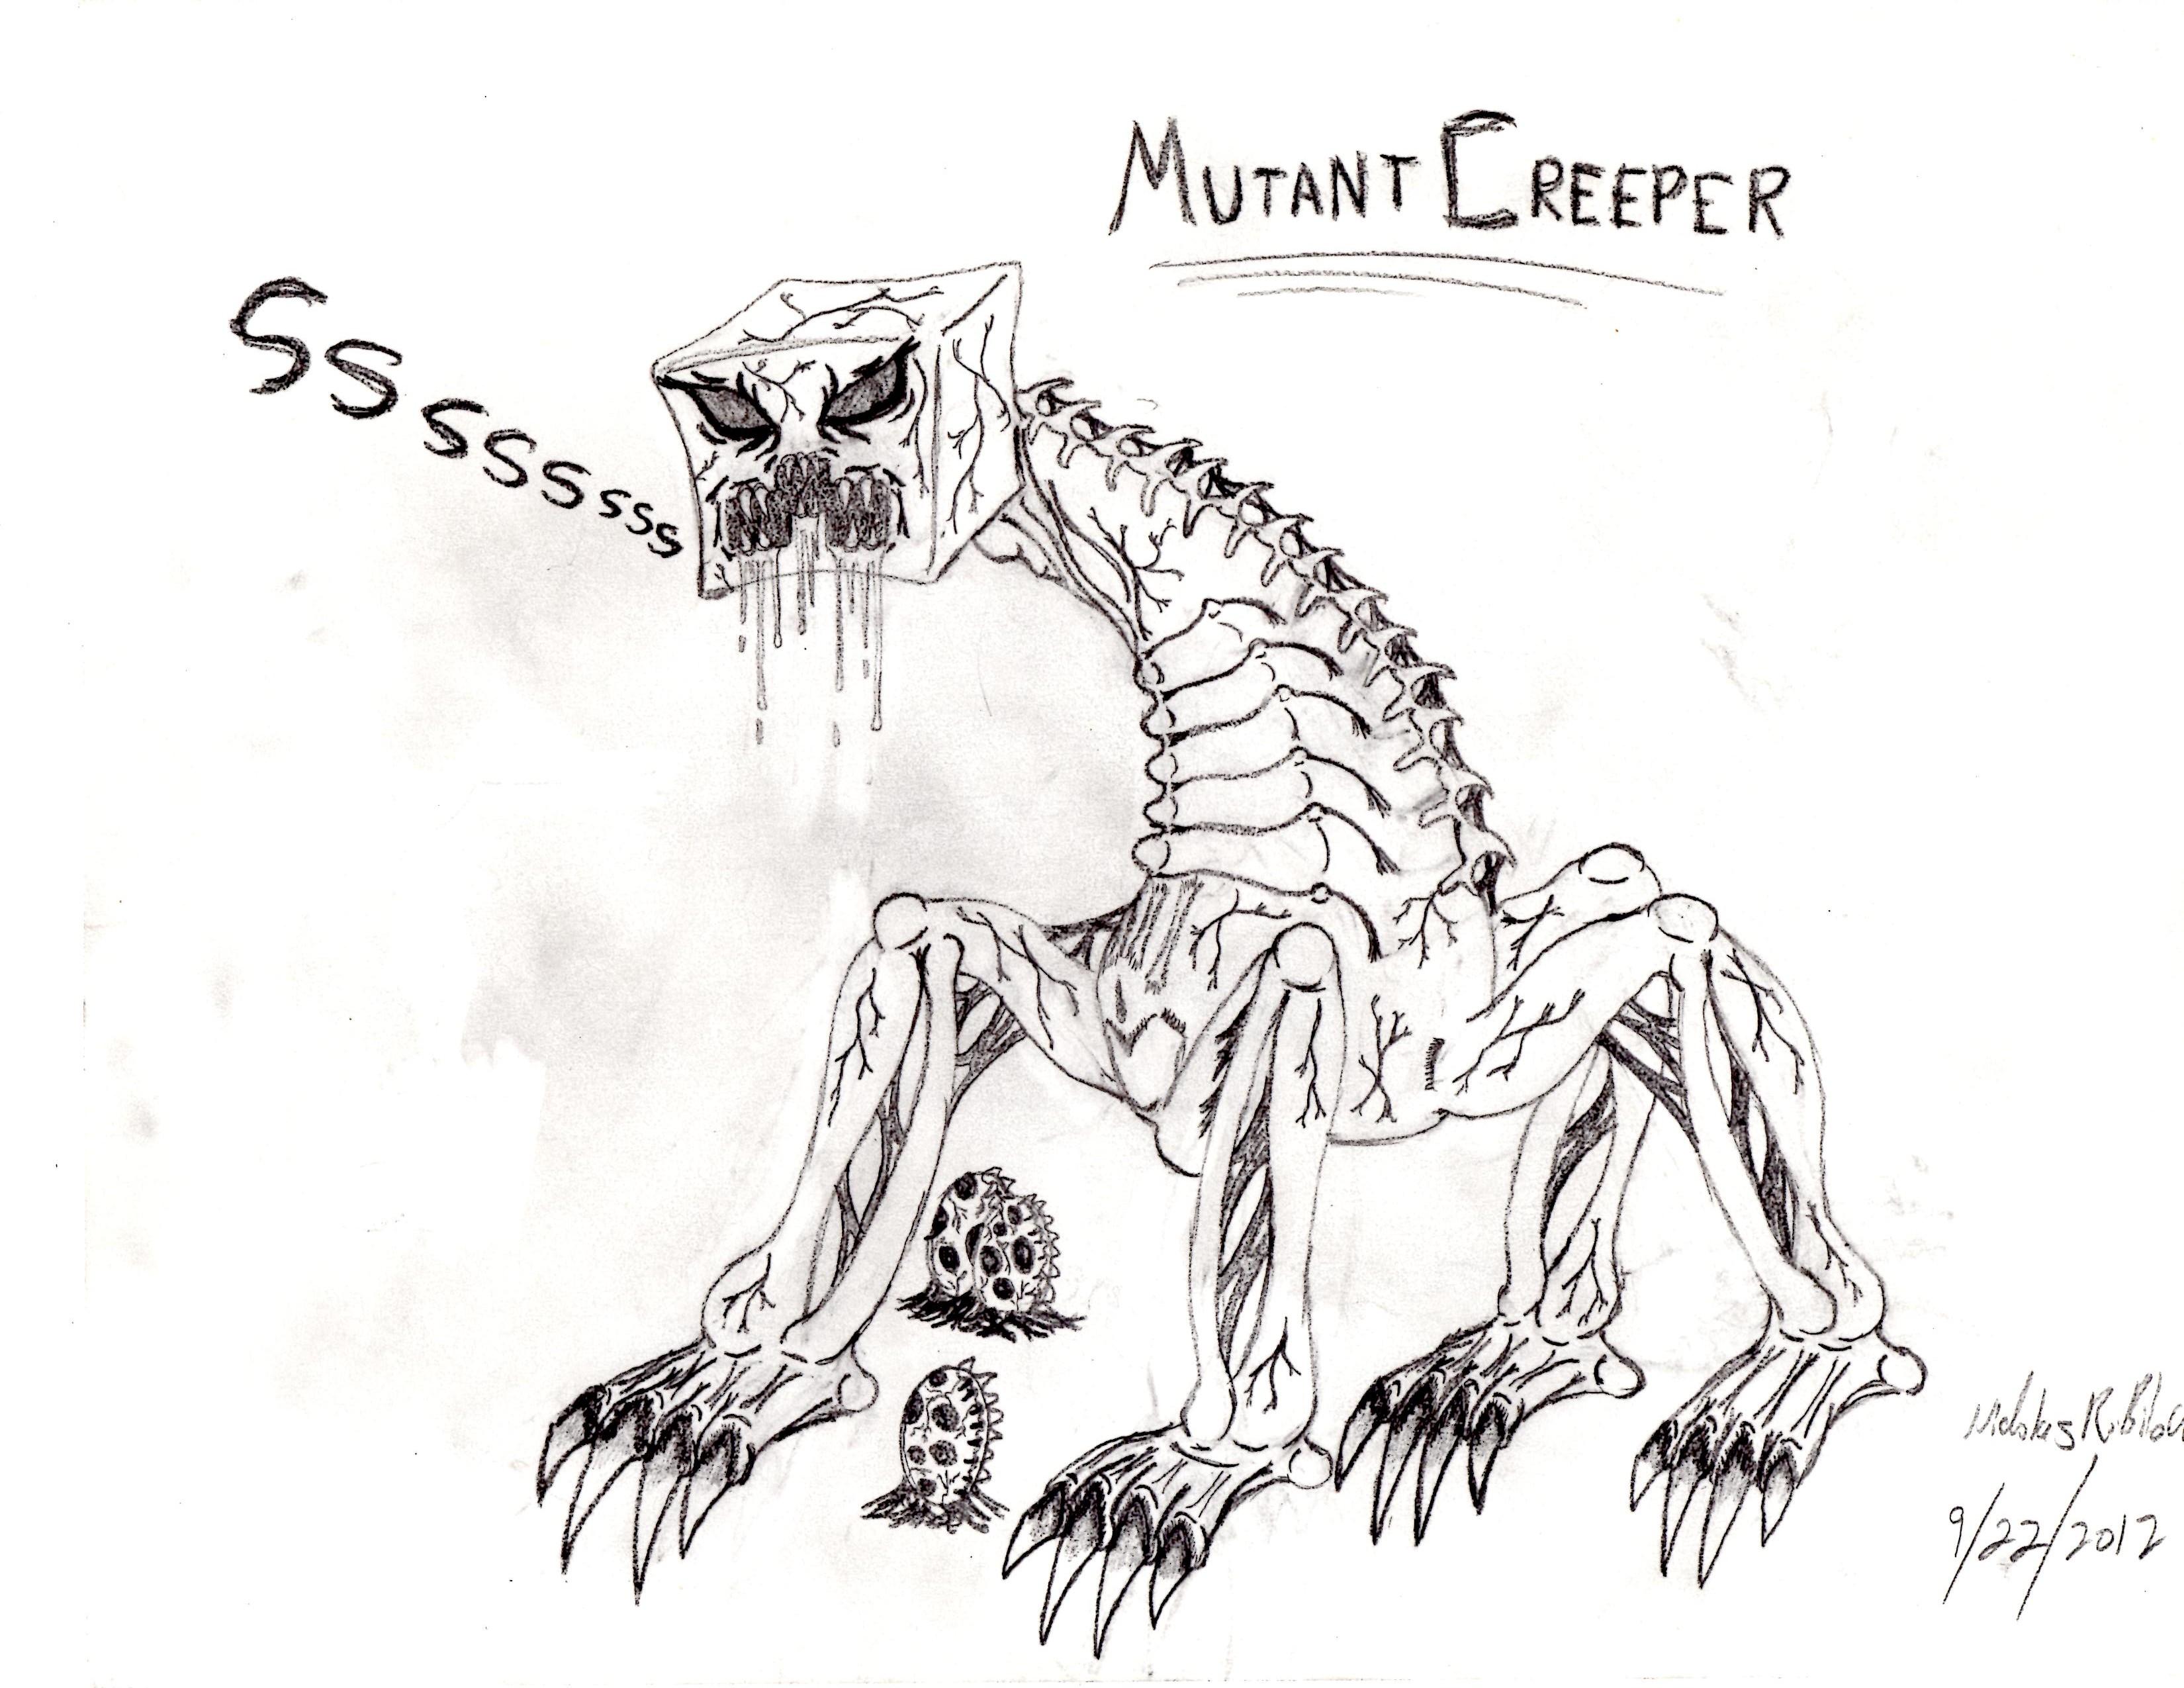 Minecraft Mutant Creeper Coloring